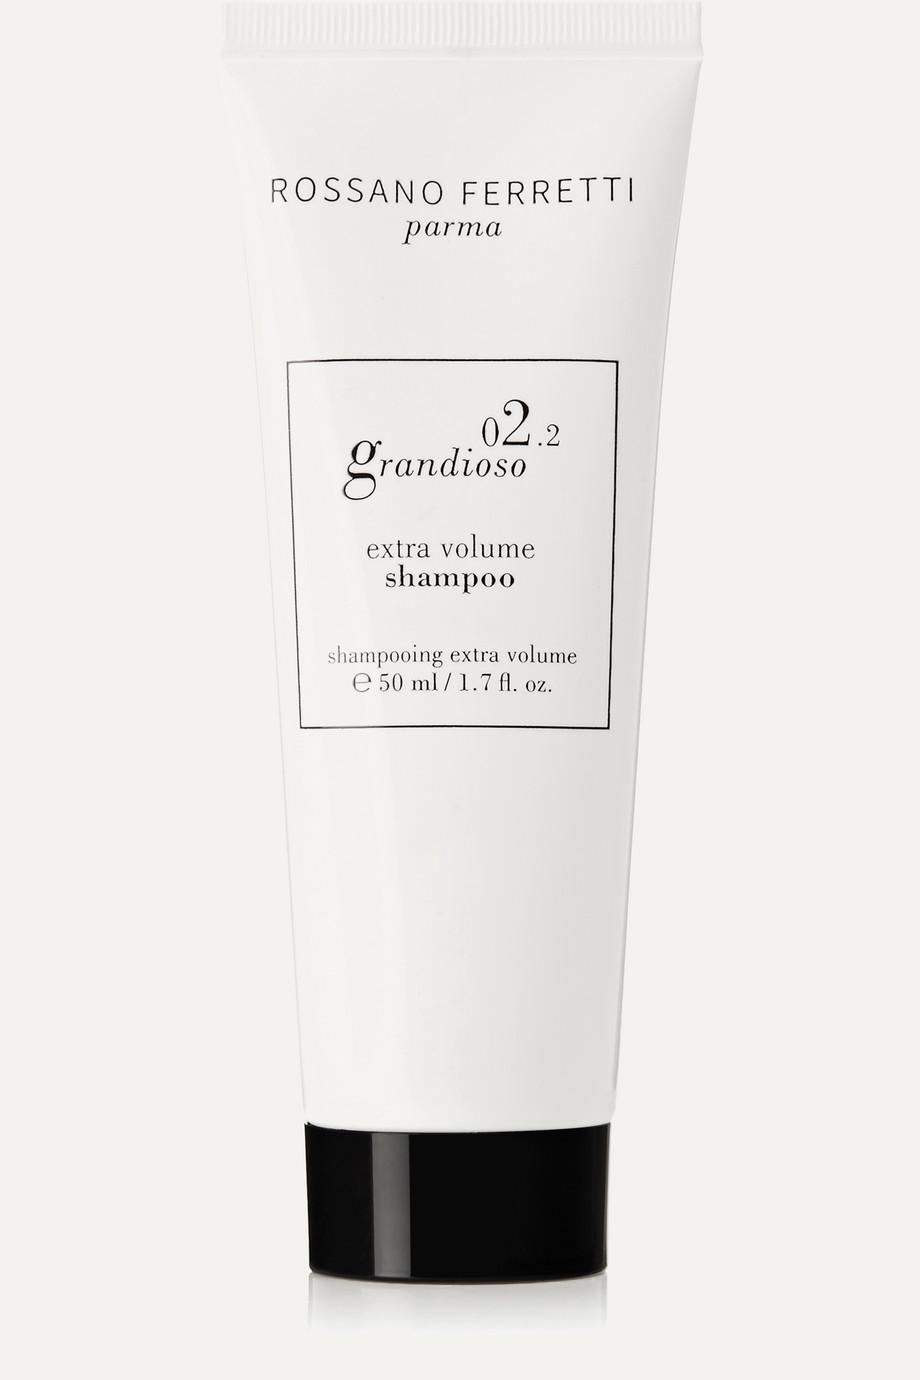 ROSSANO FERRETTI Parma Grandioso Extra Volume Shampoo, 50 ml – Volumenshampoo